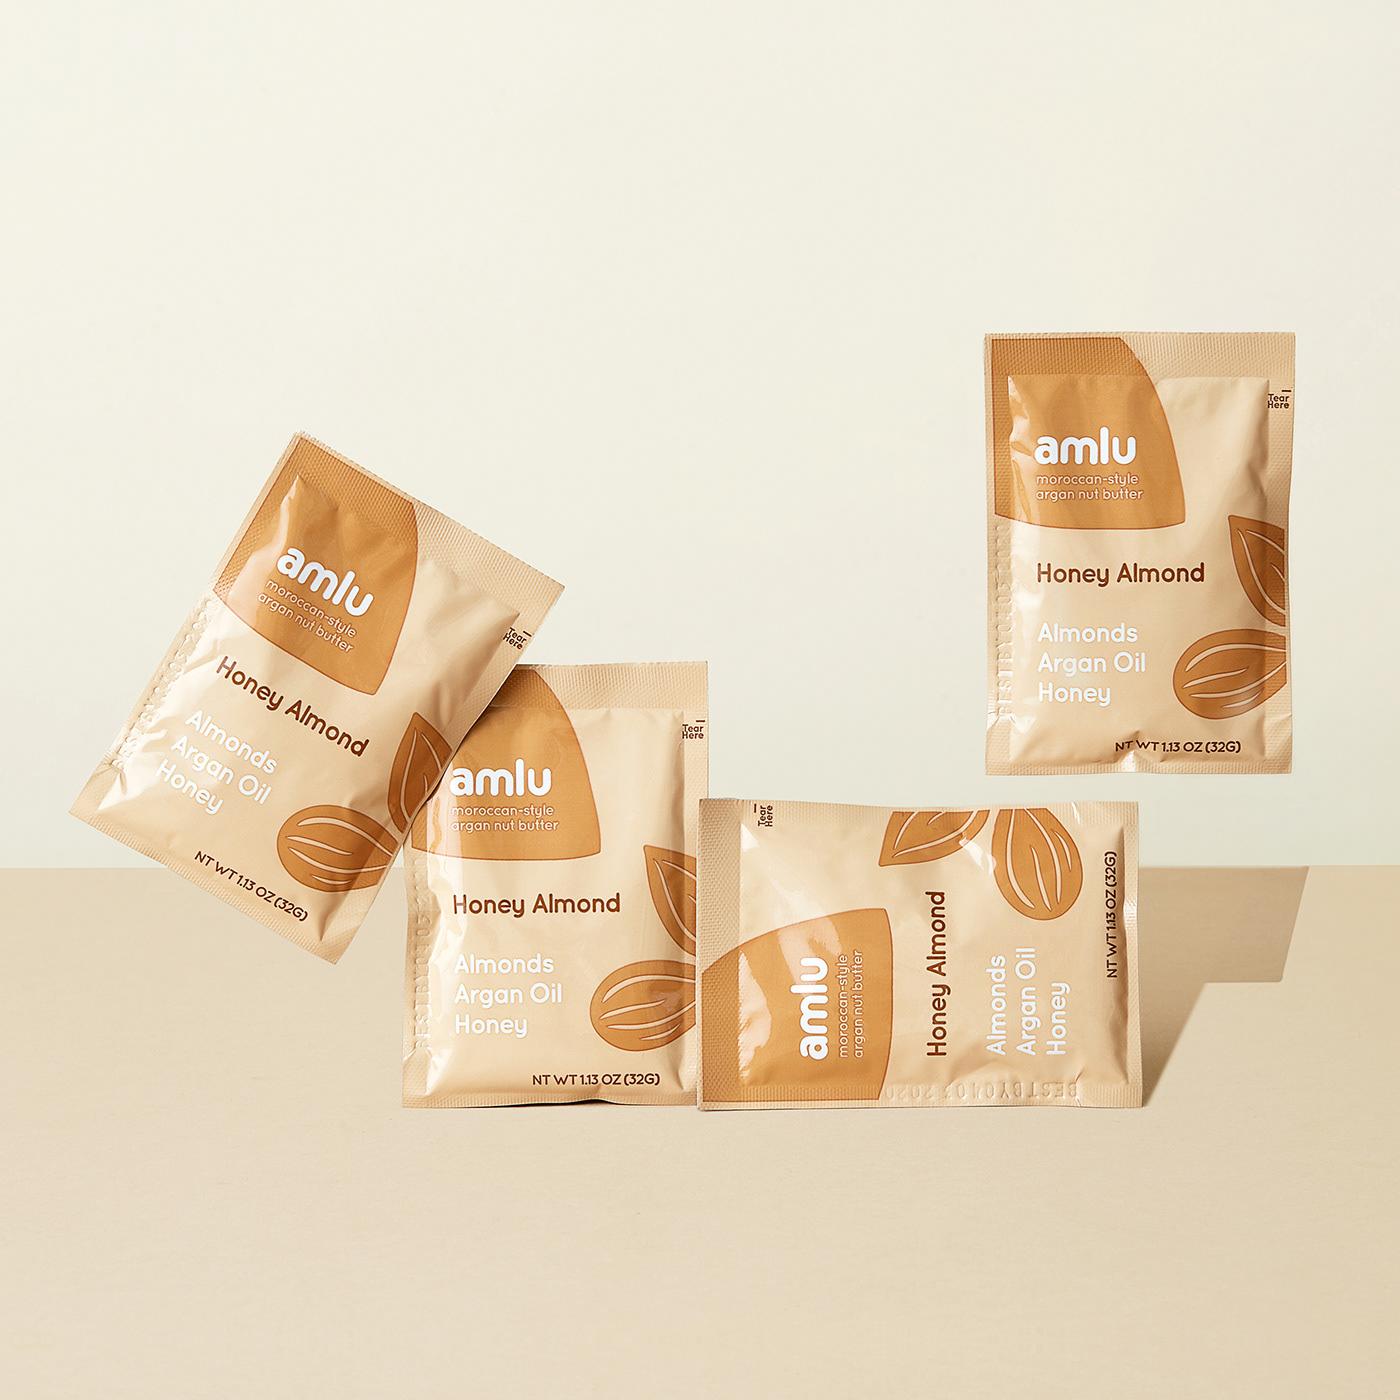 Jo Cutri Studio. Branding. Logo. Packaging Design. Graphic Design. Packaging. Los Angeles. Brand